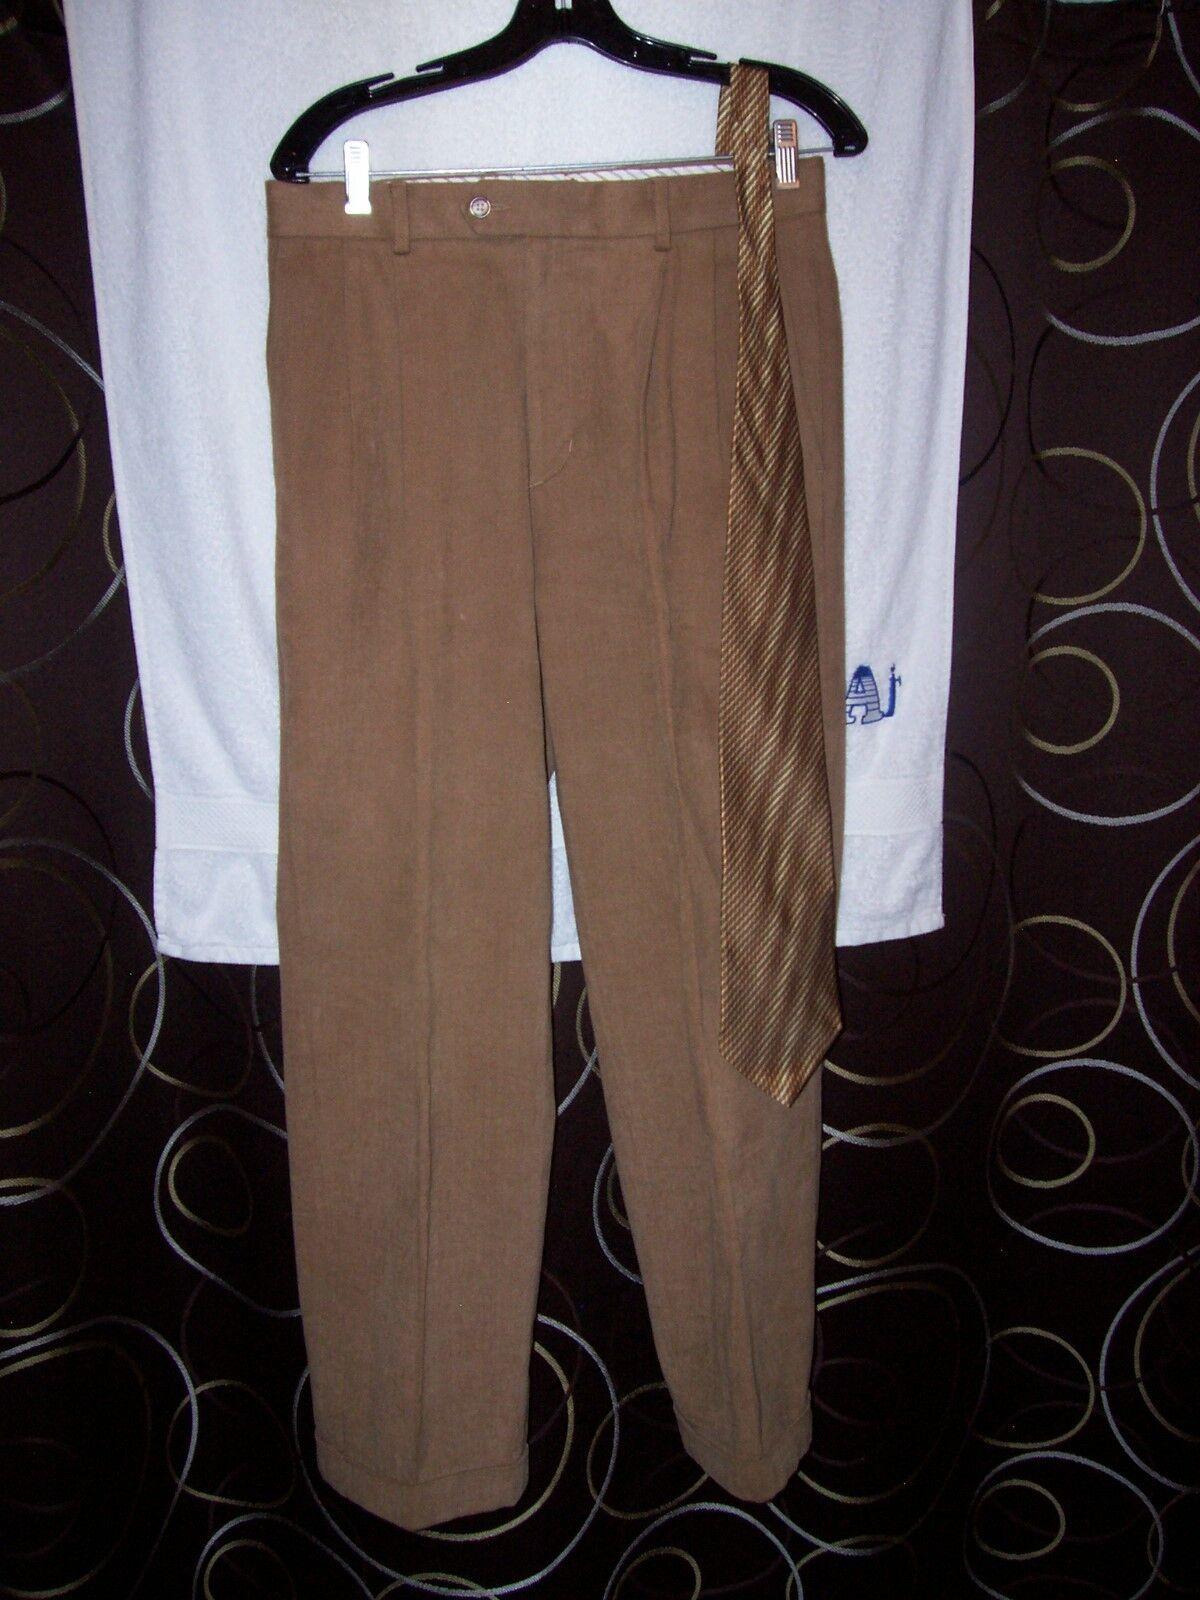 Men's sz 30 x 28 (2  to add) Bobby Jones Collection lux pants & Jhane Barne tie